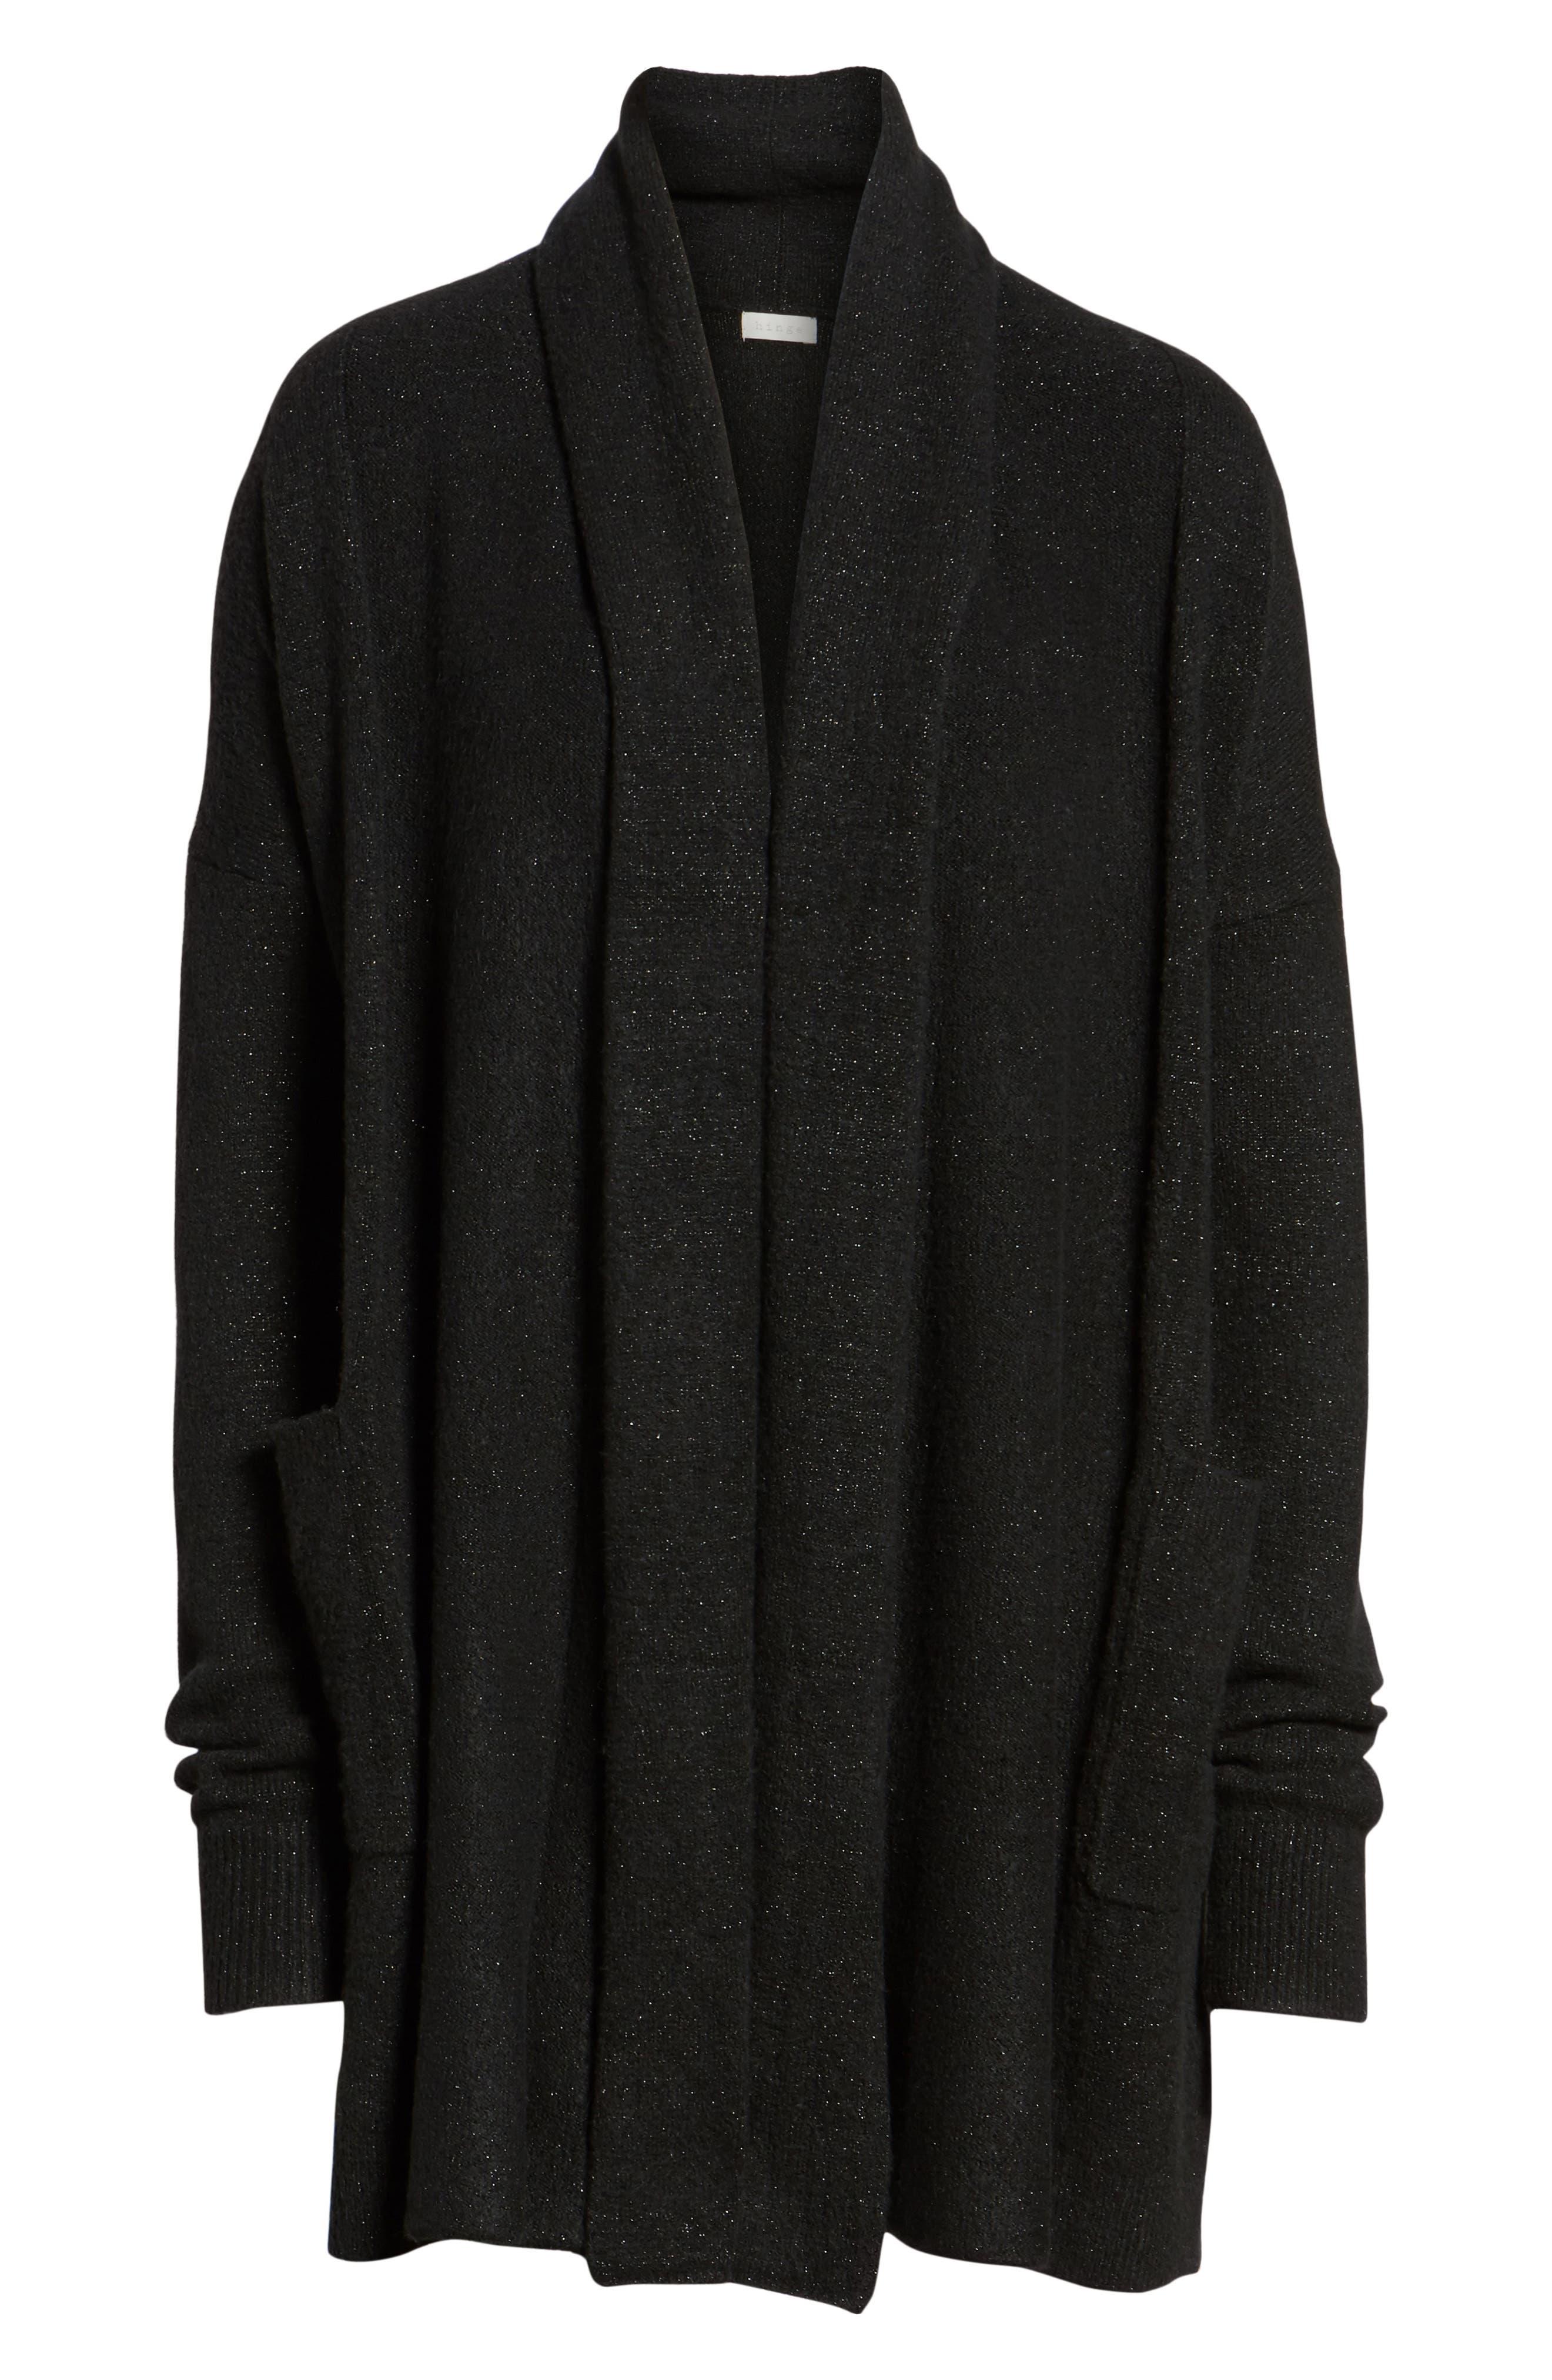 Cardigan Sweater,                             Alternate thumbnail 6, color,                             001